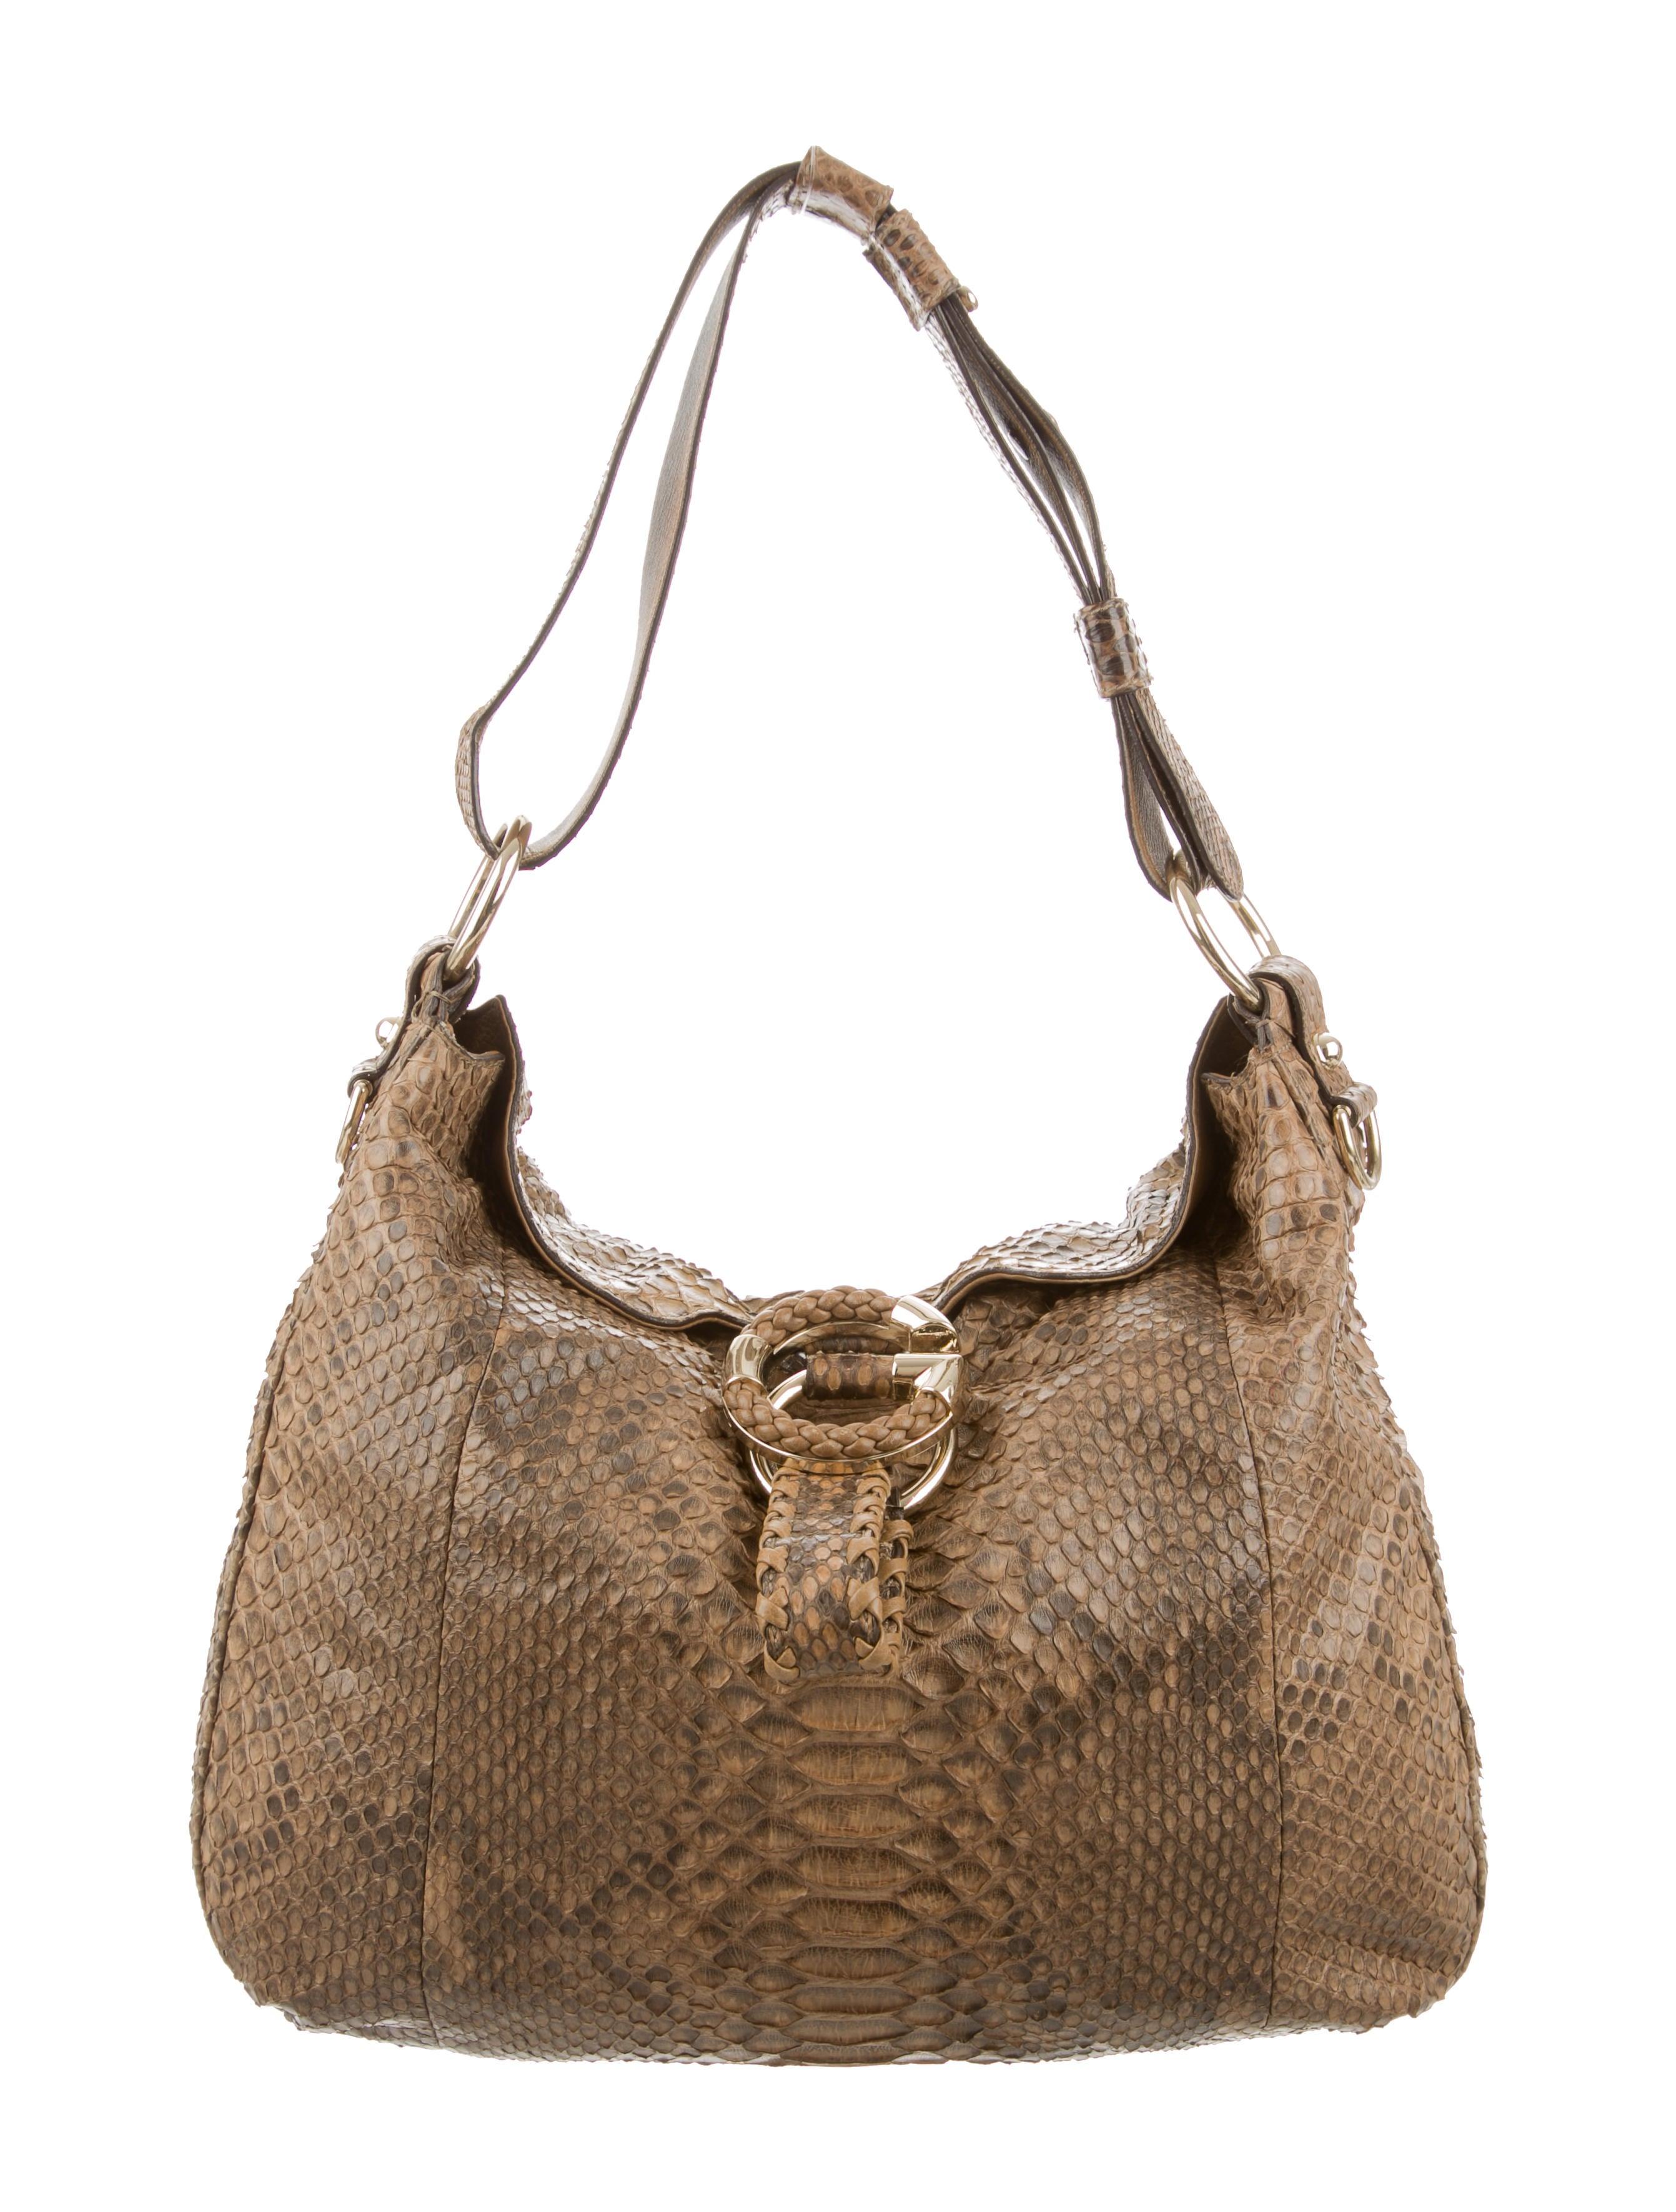 d2c05ae7e0c Gucci Python G Wave Hobo - Handbags - GUC120486